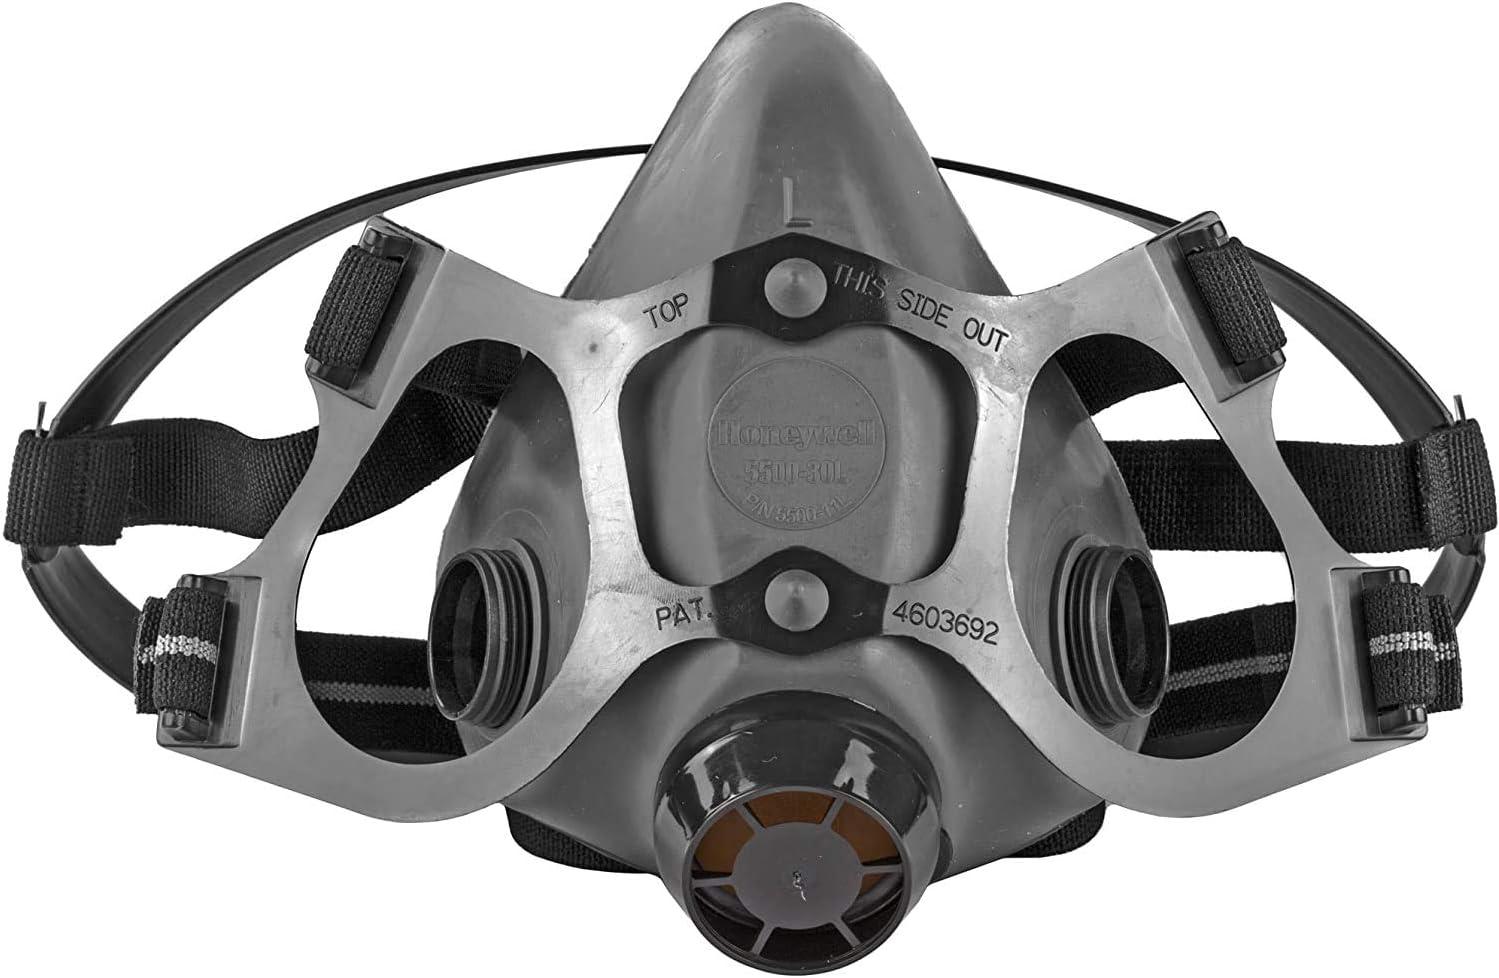 NORTH 550030L HALF MASK RESPIRATOR - Half Mask Respirator 5500 Series (Large) New